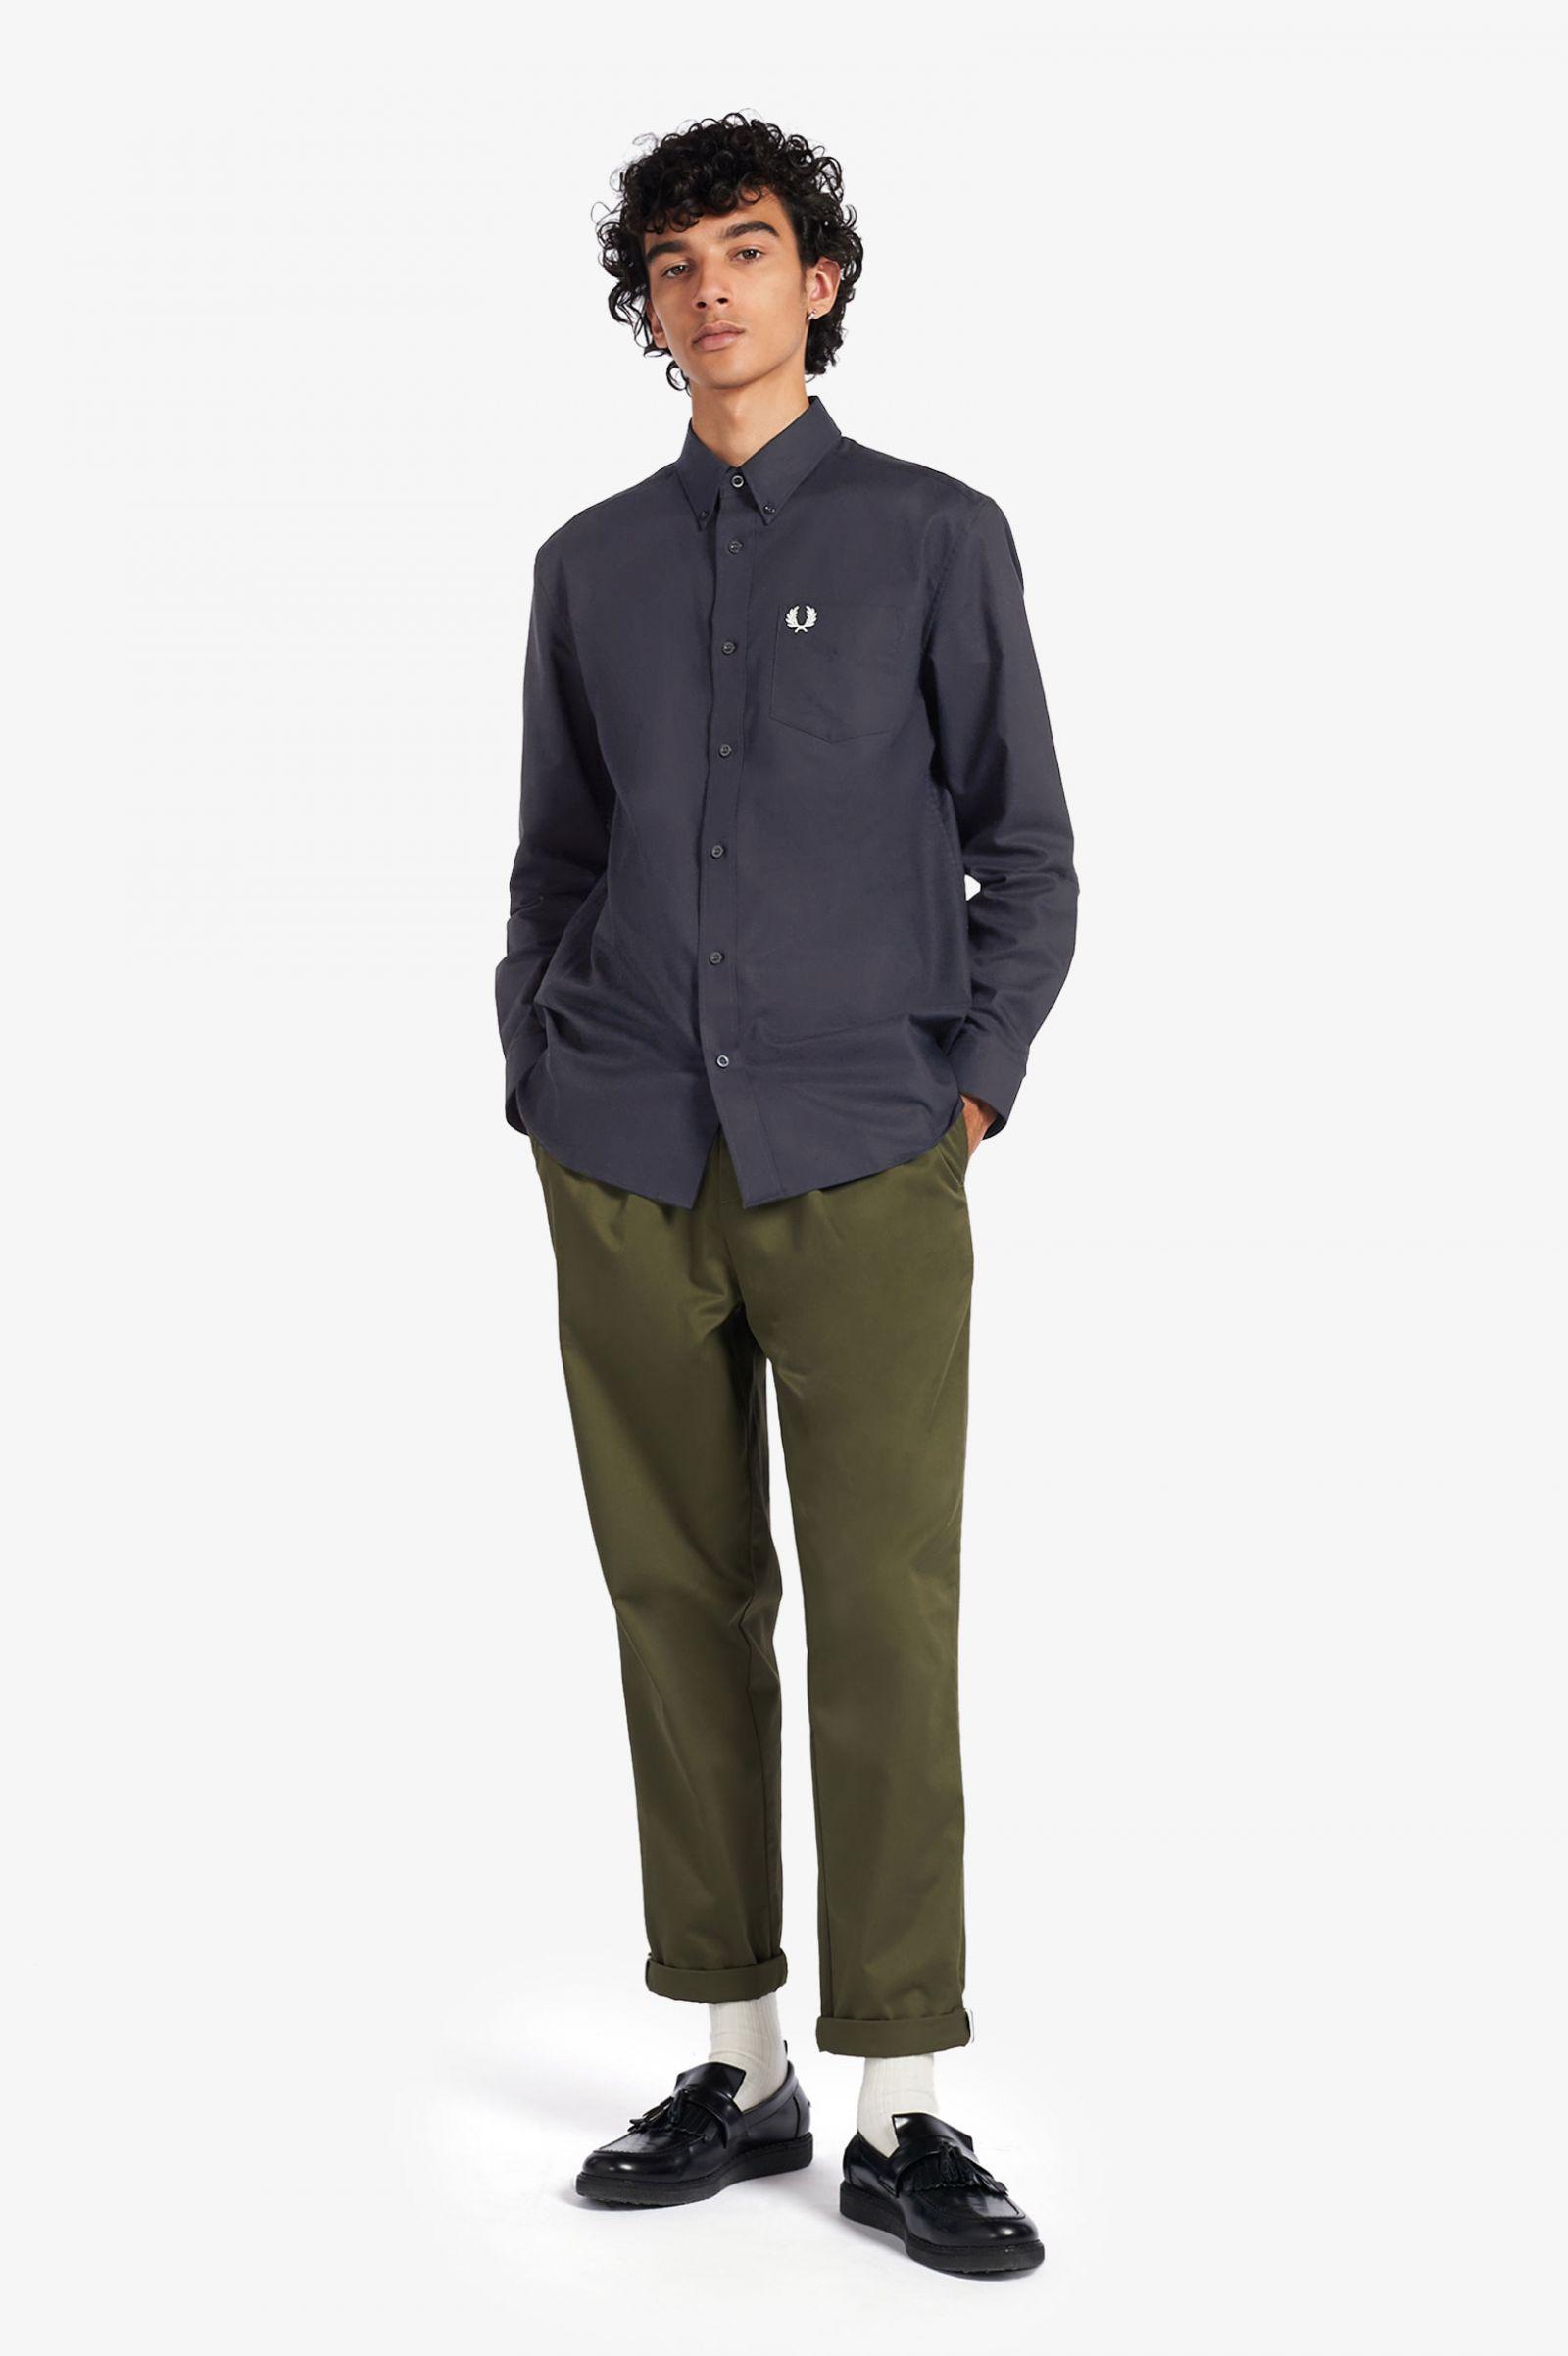 FRED PERRY Classic Oxford Shirt Hemd navy M3531-608 Kurzarm